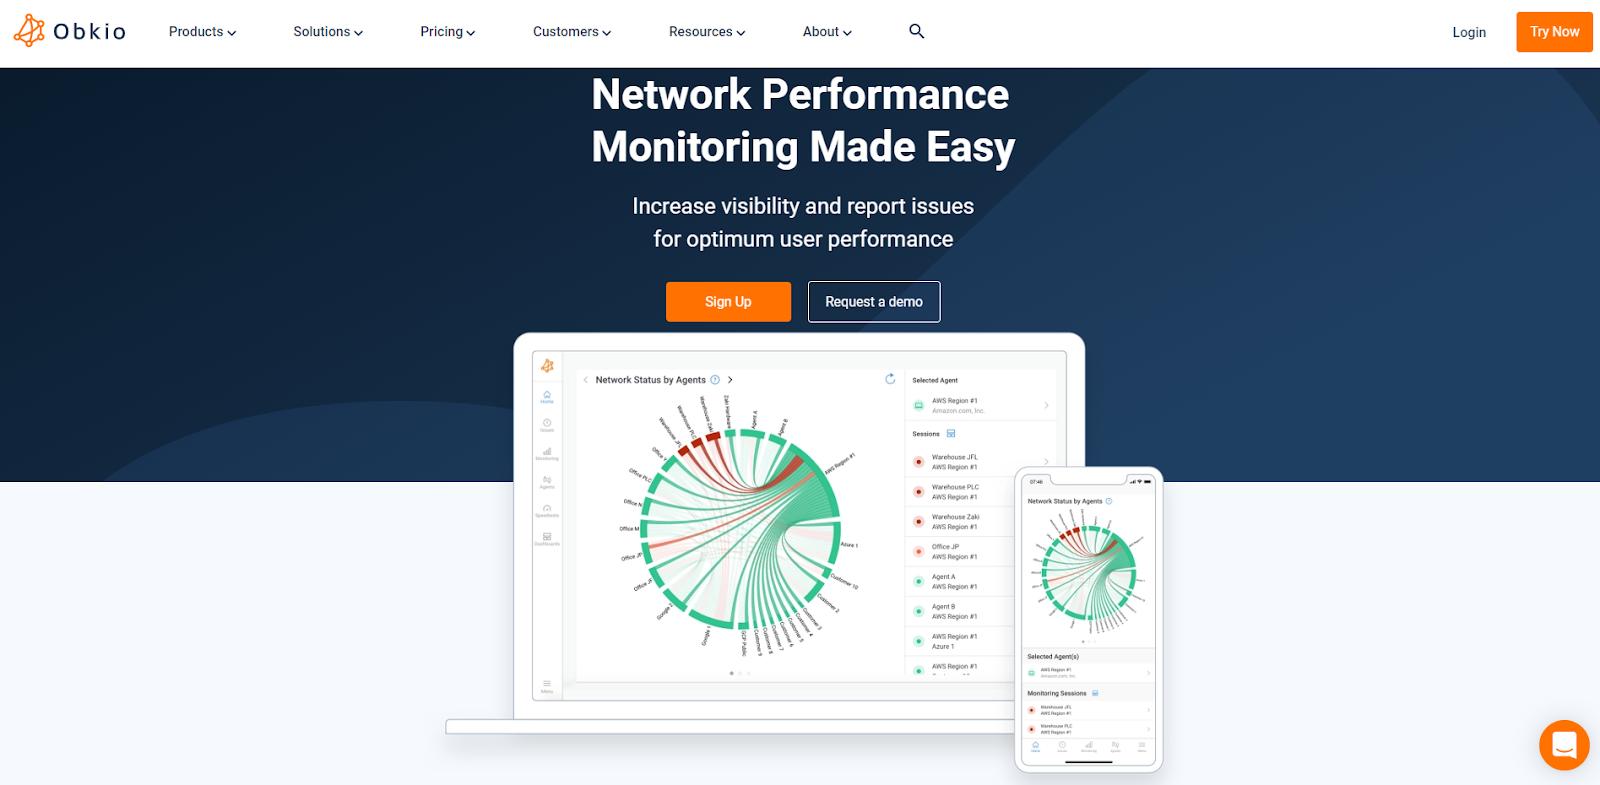 Obkio Network Monitoring Tool